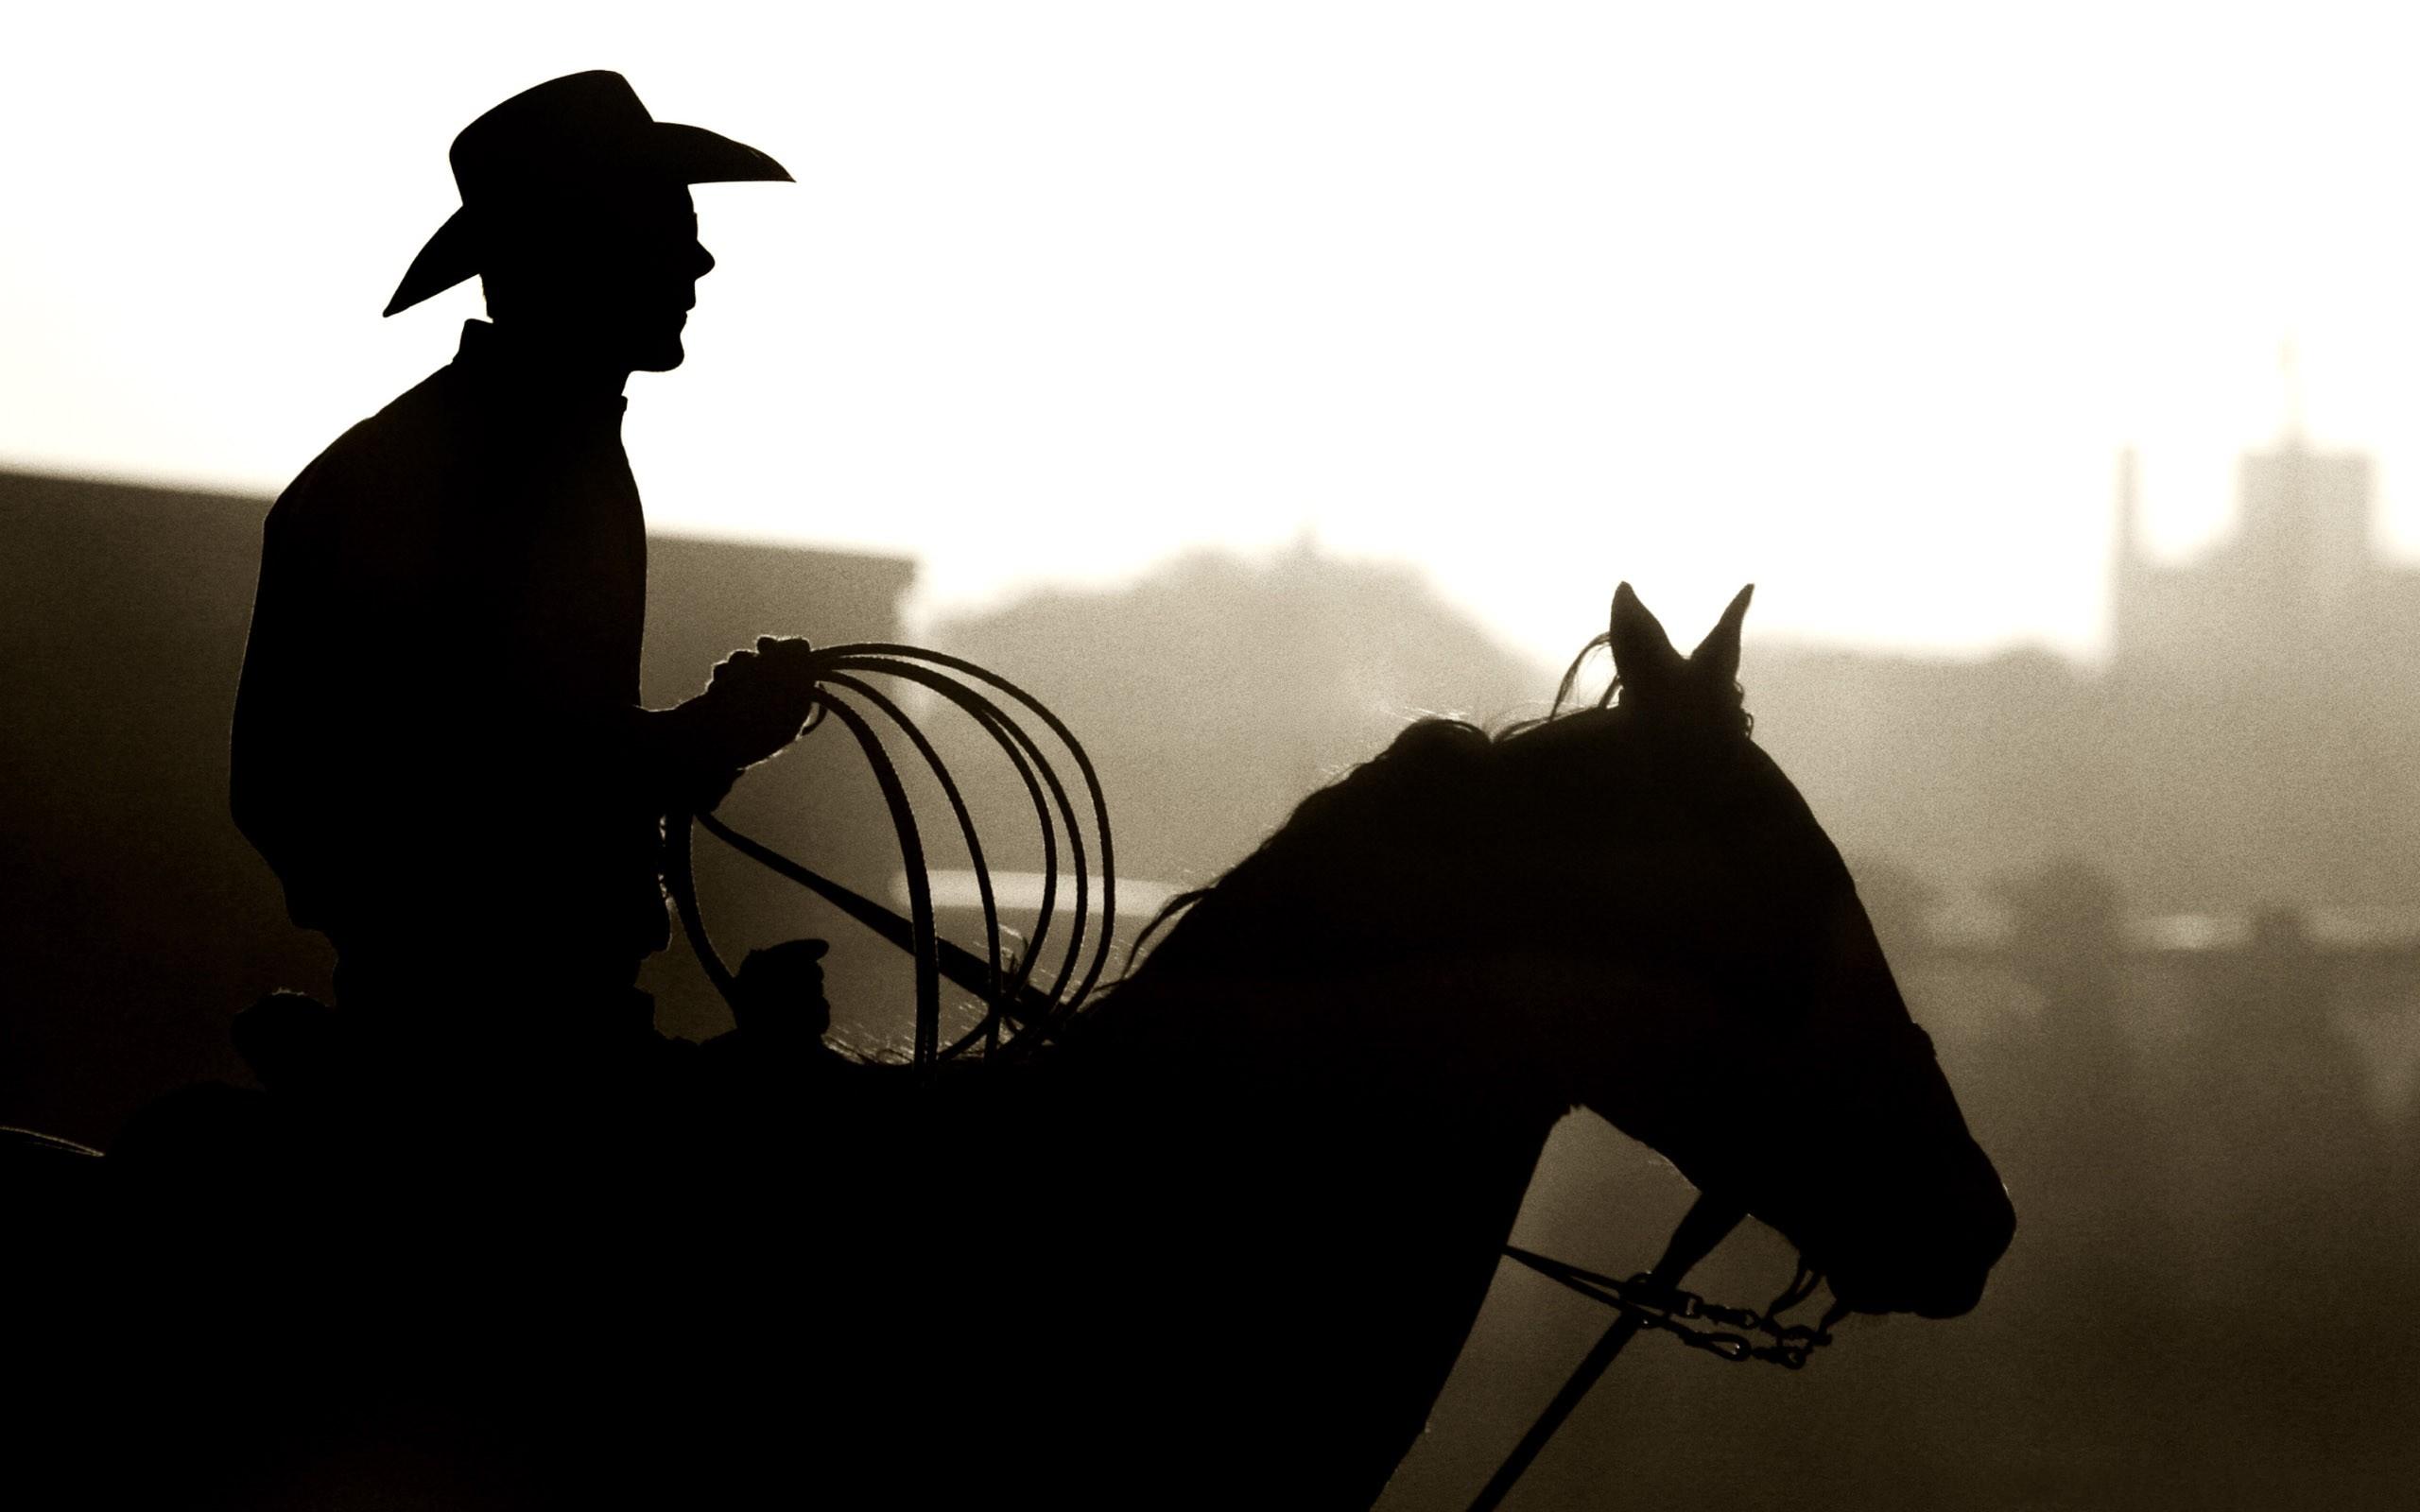 wallpaper.wiki-Western-Cowboy-Background-PIC-WPD00113